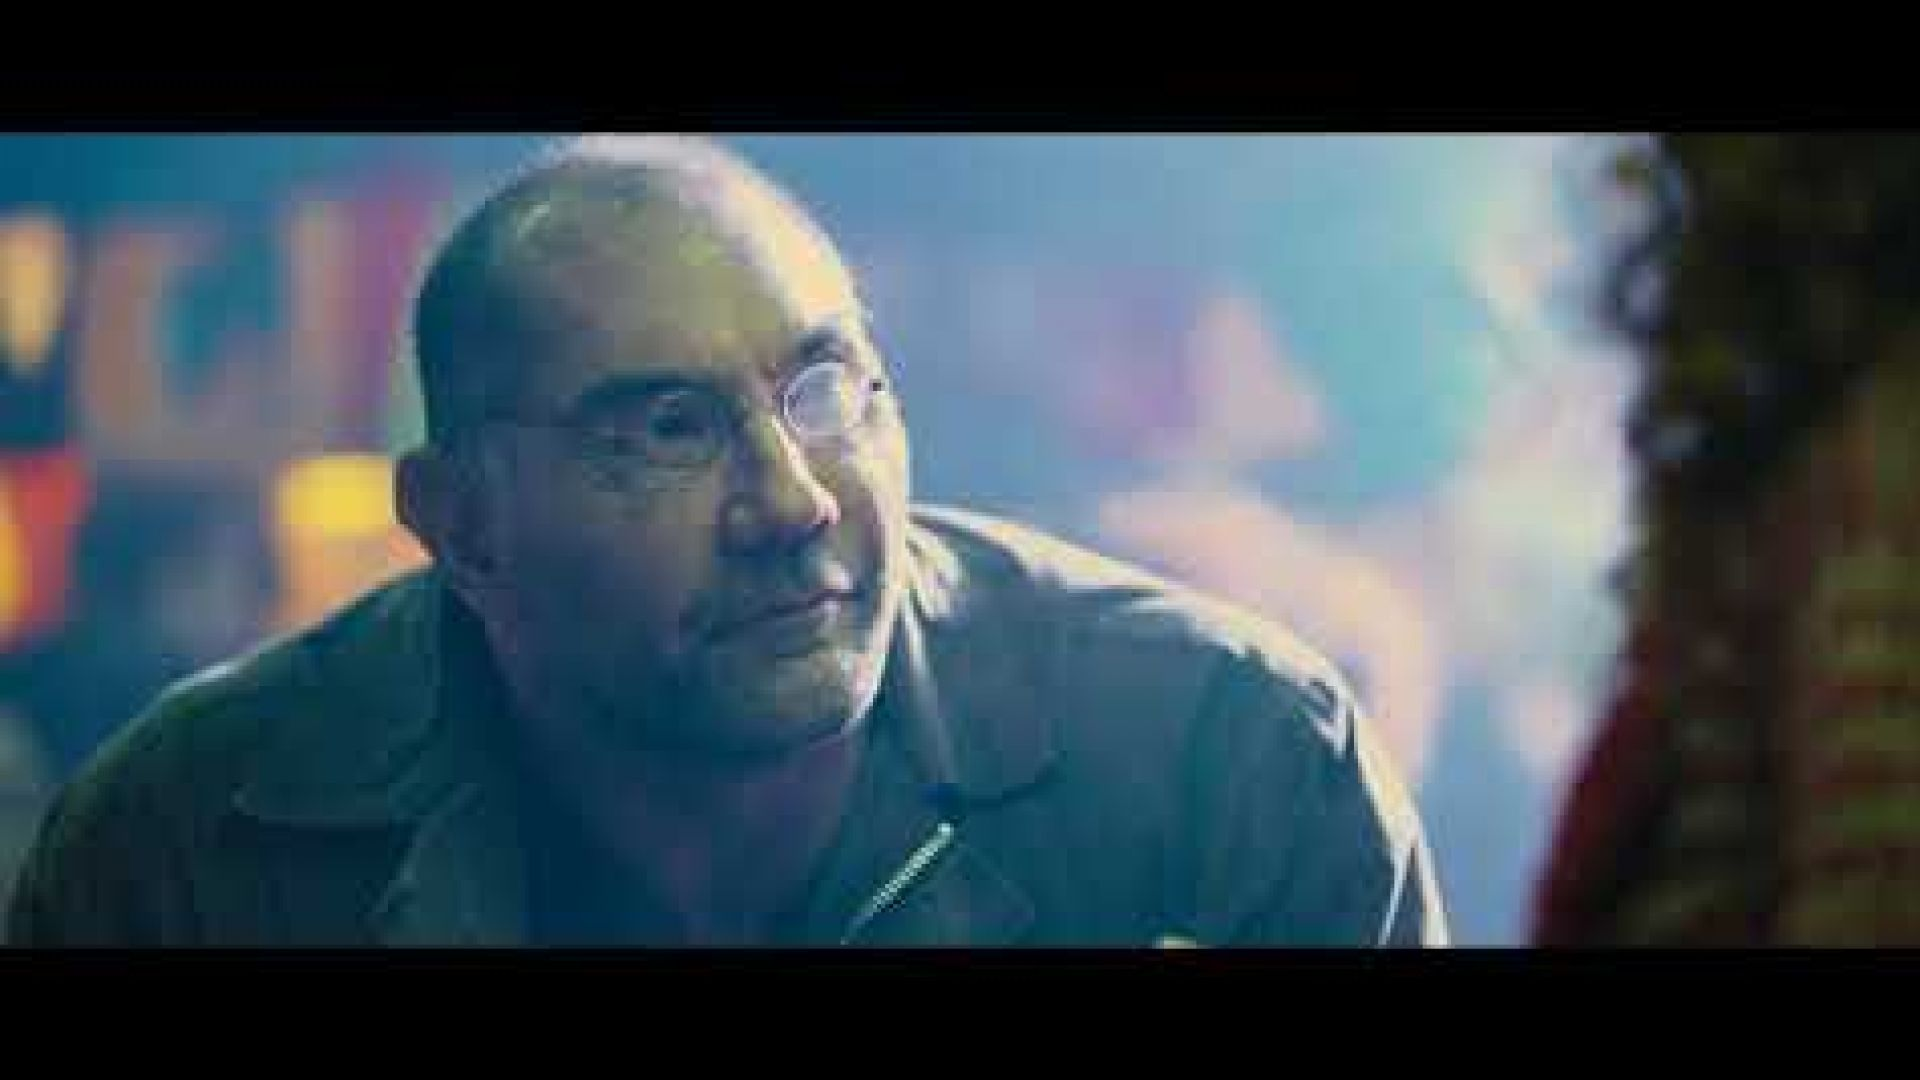 Blade Runner 2049 Featurette: 'Nowhere To Run'